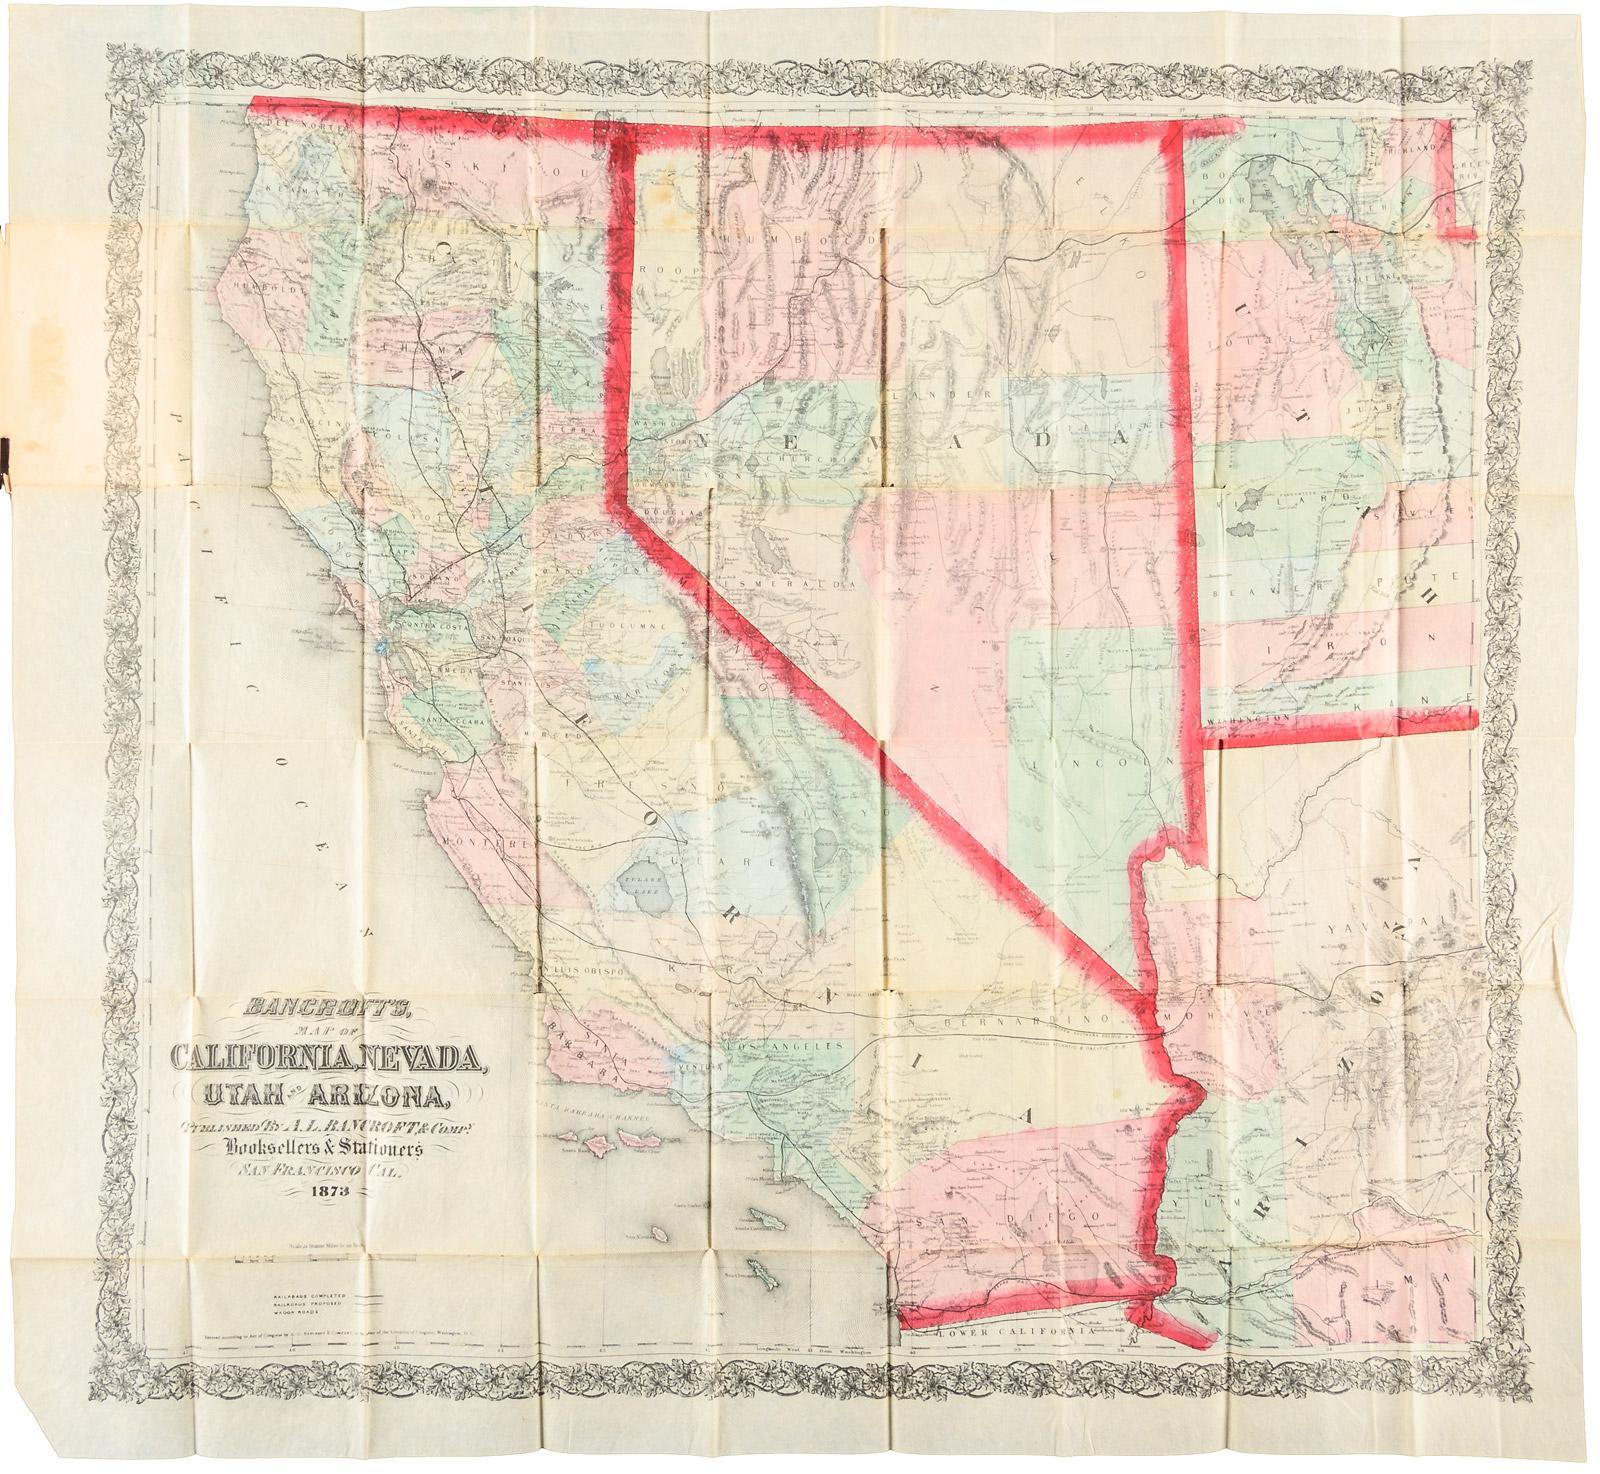 Map Of Nevada Utah And Arizona.Bancroft S Map Of California Nevada Utah And Arizona Published By